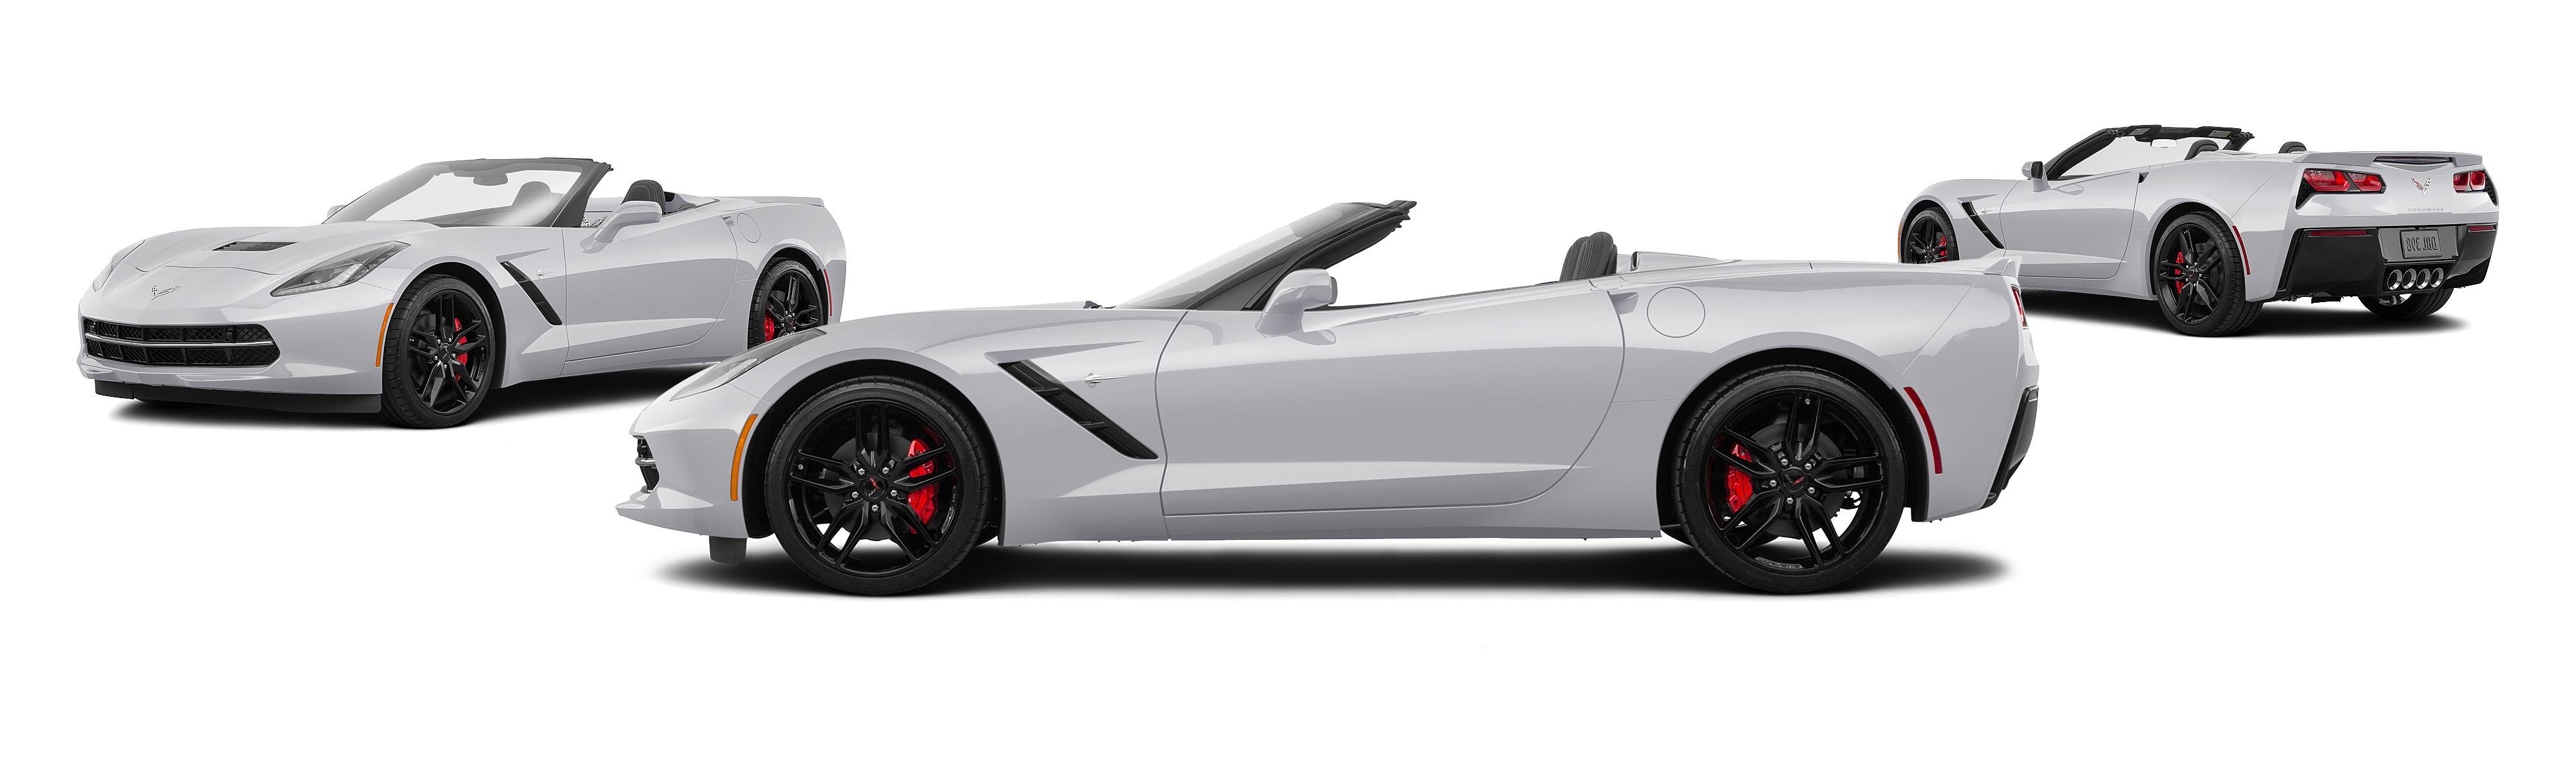 2019 chevrolet corvette zr1 2dr convertible w 1zr research groovecar rh groovecar com